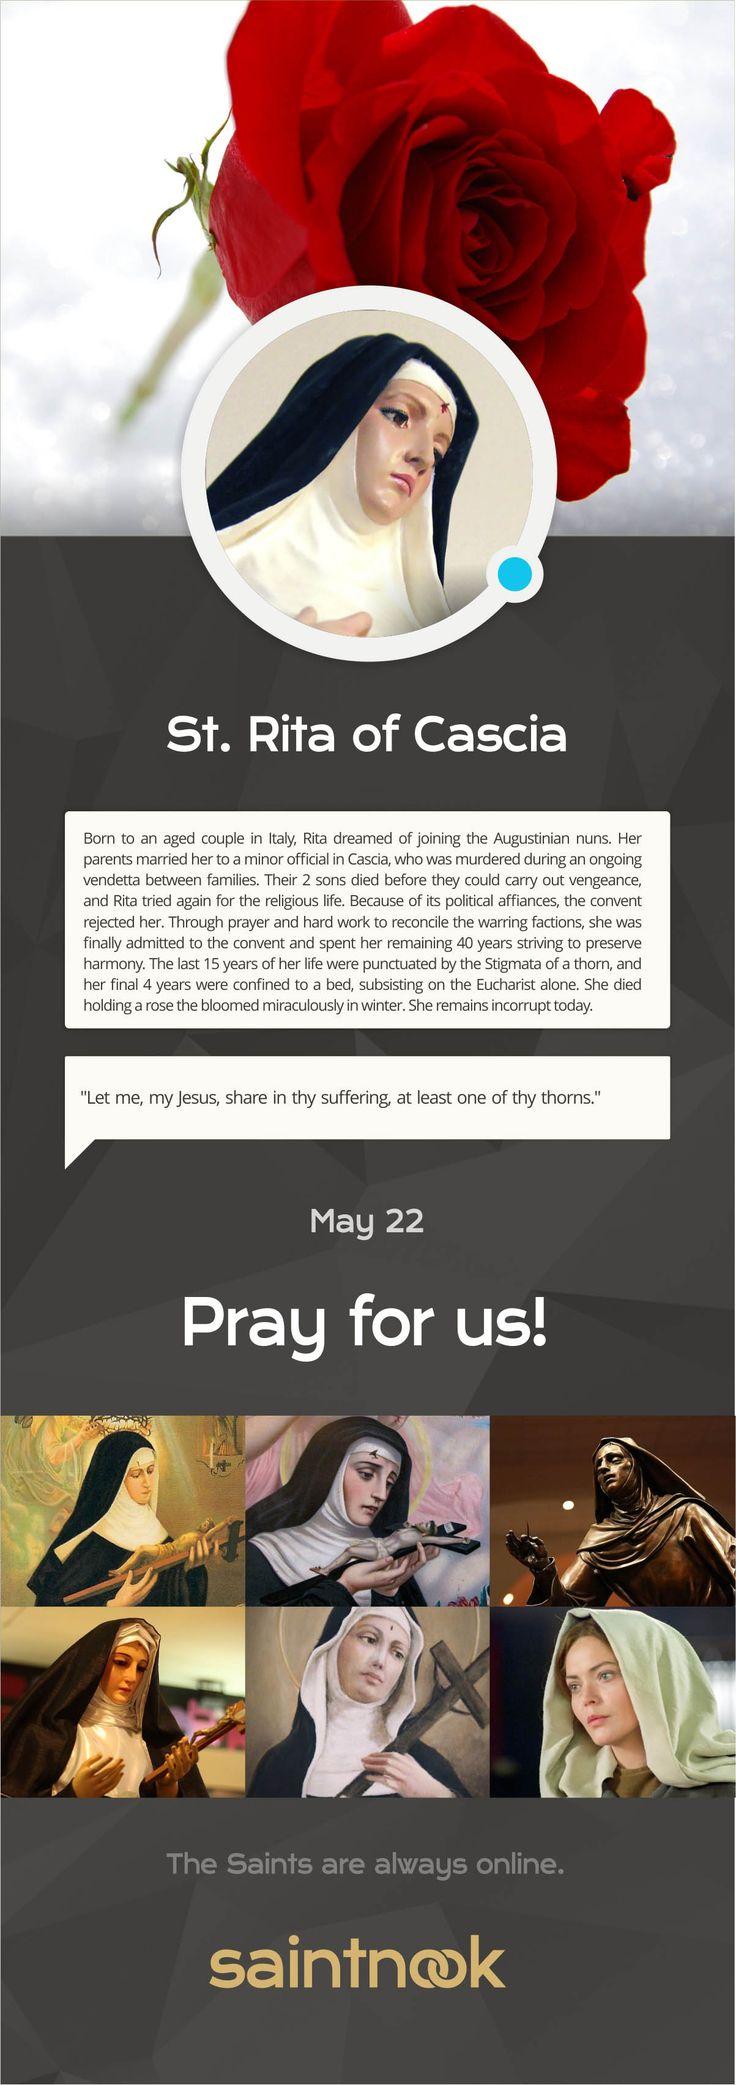 Saint Rita of Cascia    www.saintnook.com/saints/rita-of-cascia